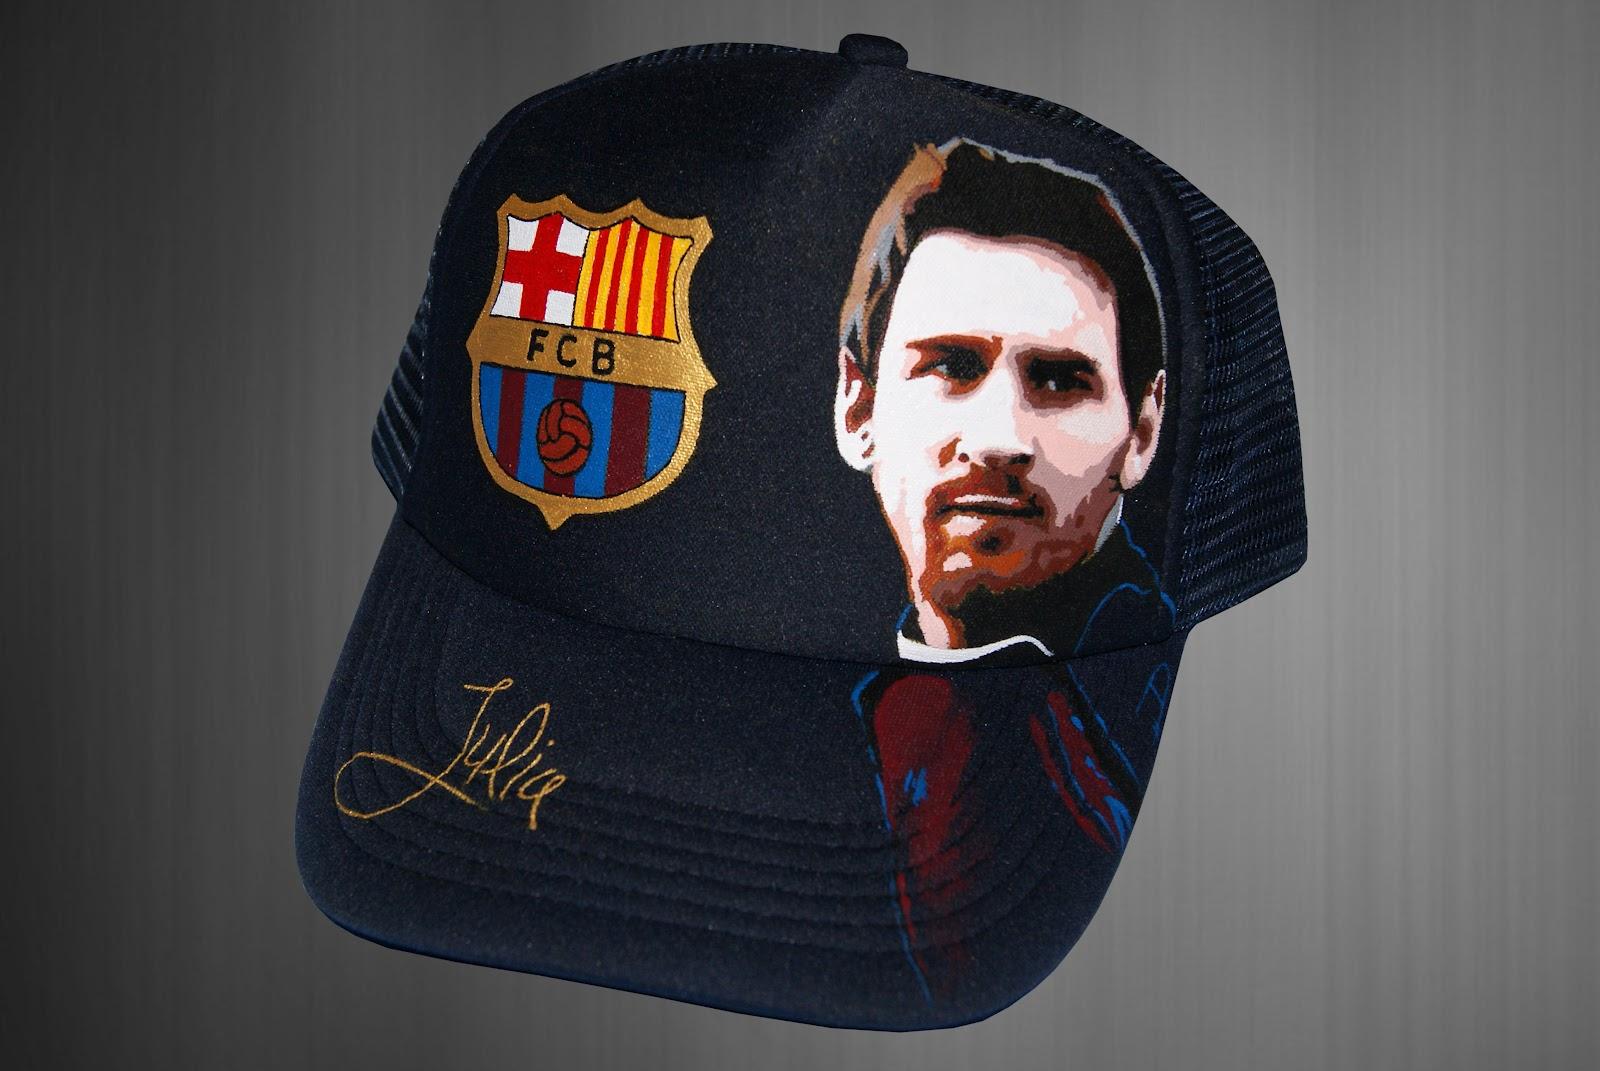 daec75b9a49a7 Otra gorra de Leo Messi personalizada para Julia con el escudo del Fútbol  Club Barcelona.